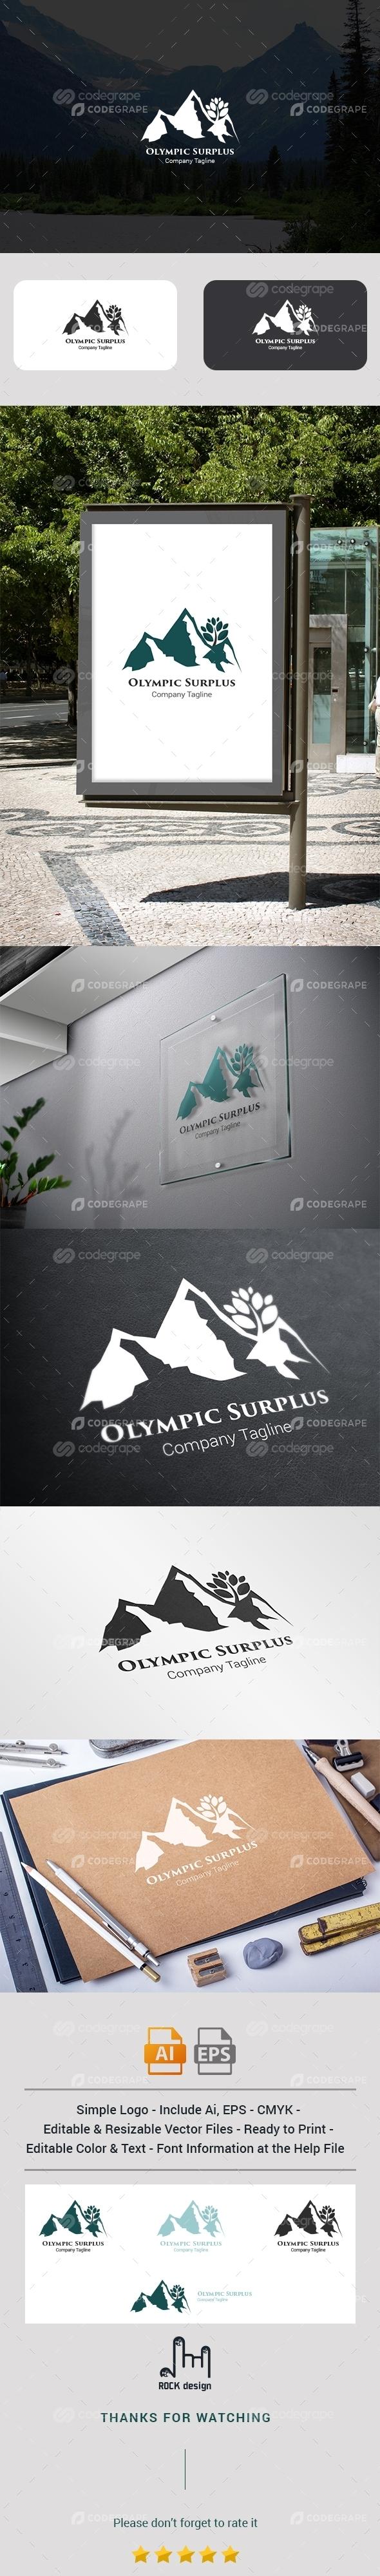 Olympic Surplus Logo